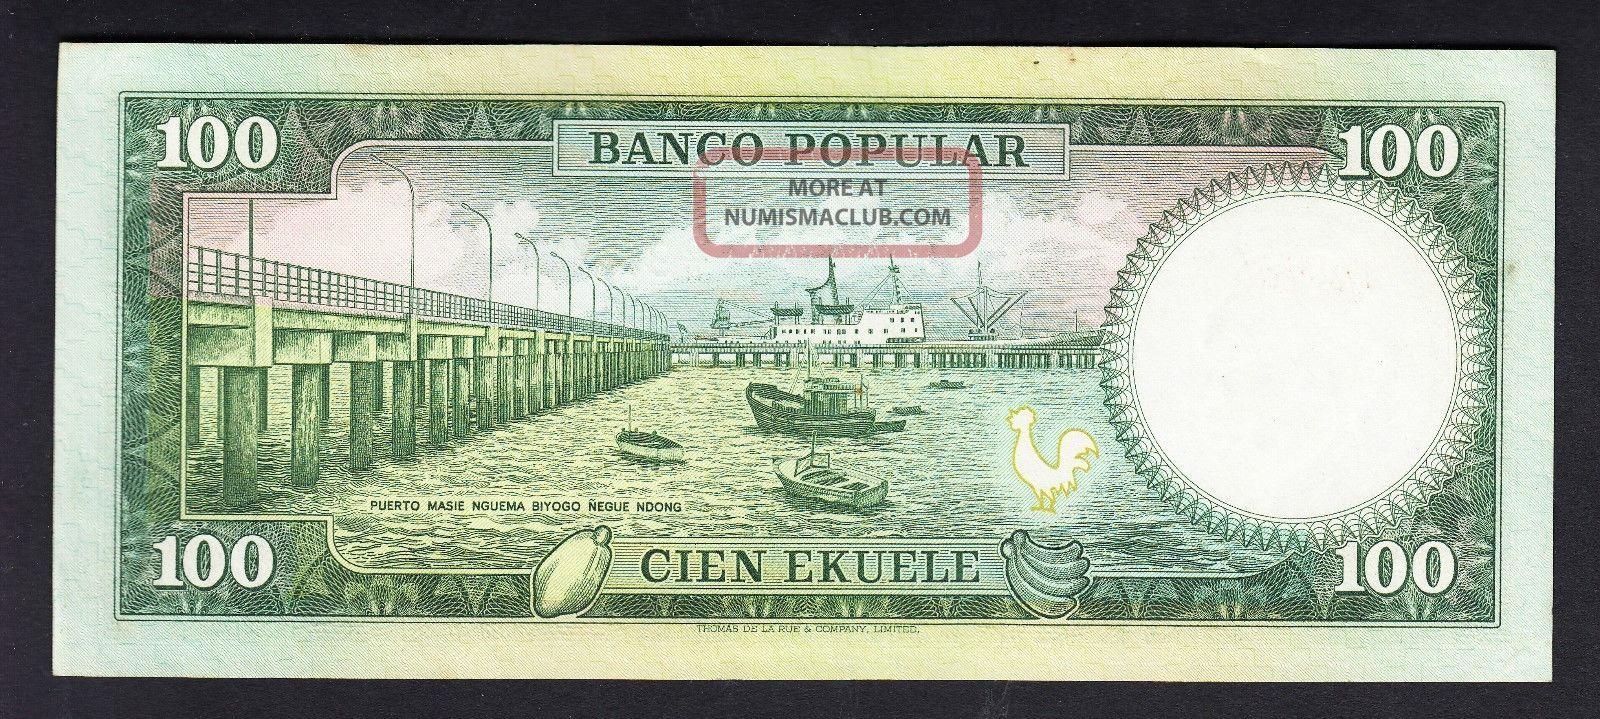 Equatorial Guinea 100 Ekuele 07-07-1975 XF+//AU P Banknotes 11 Uncirculated